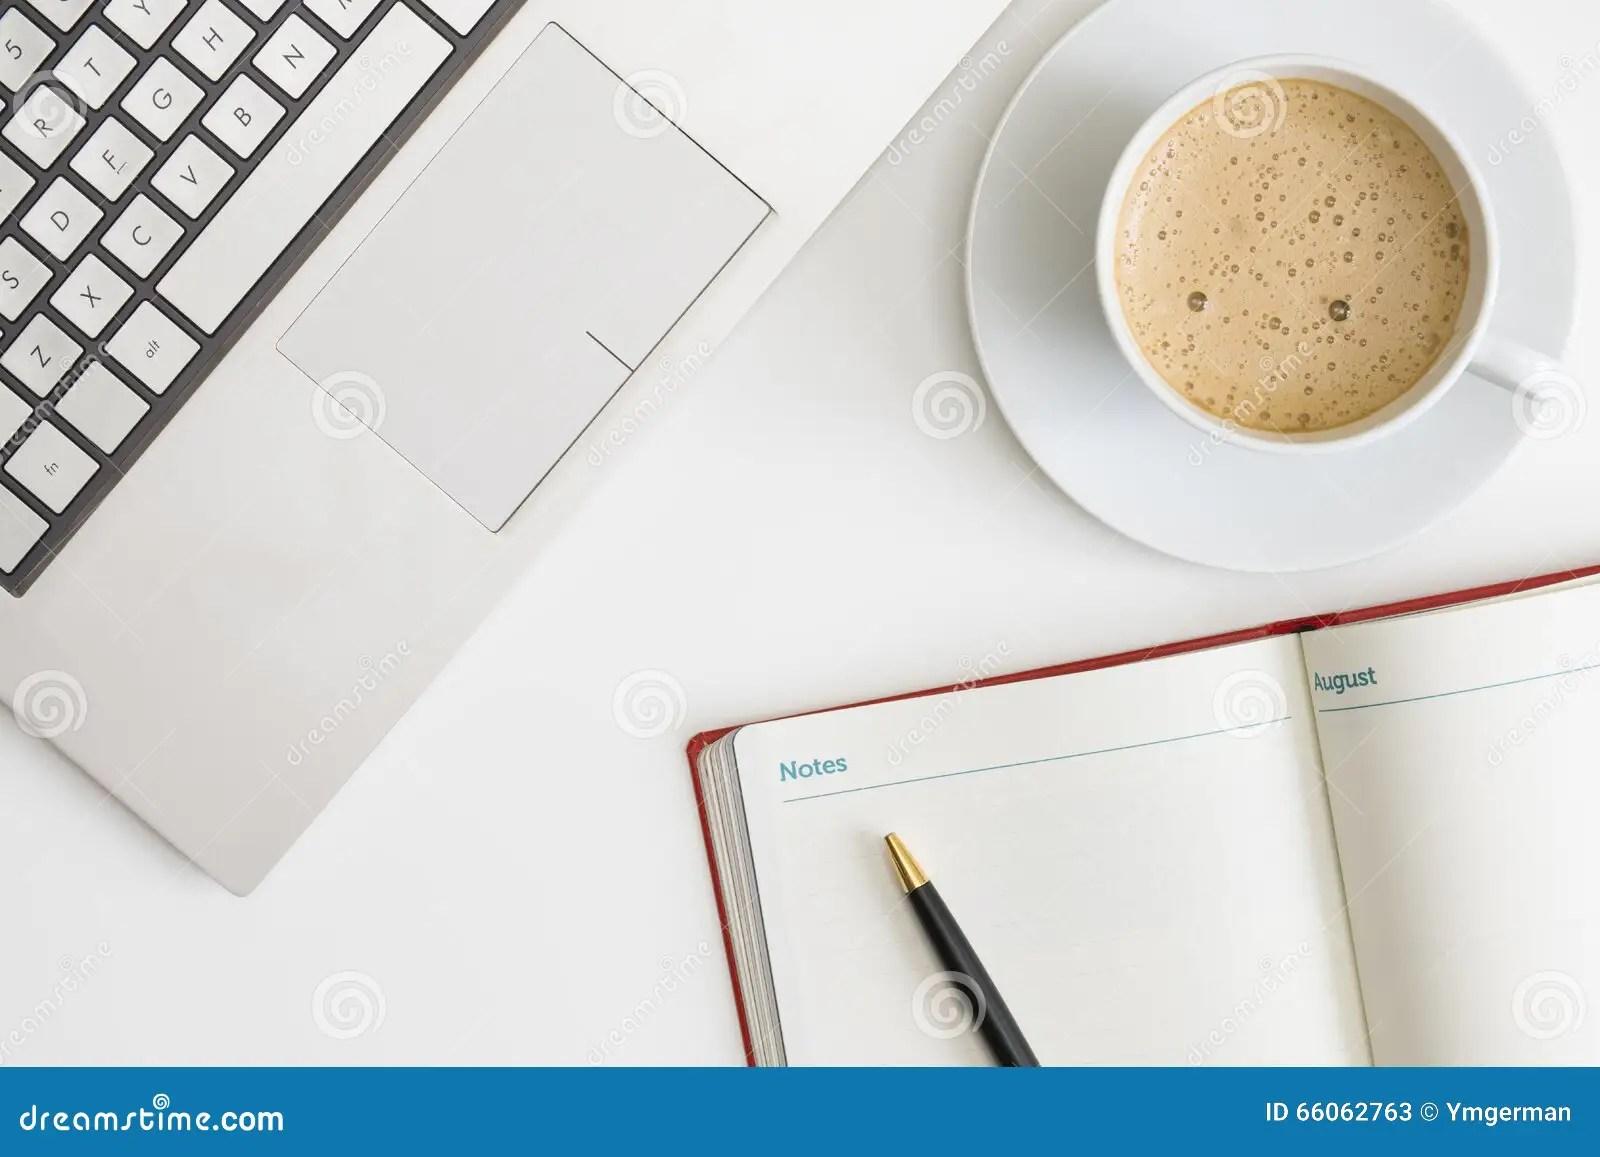 Brainstorming Business Ideas Stock Image